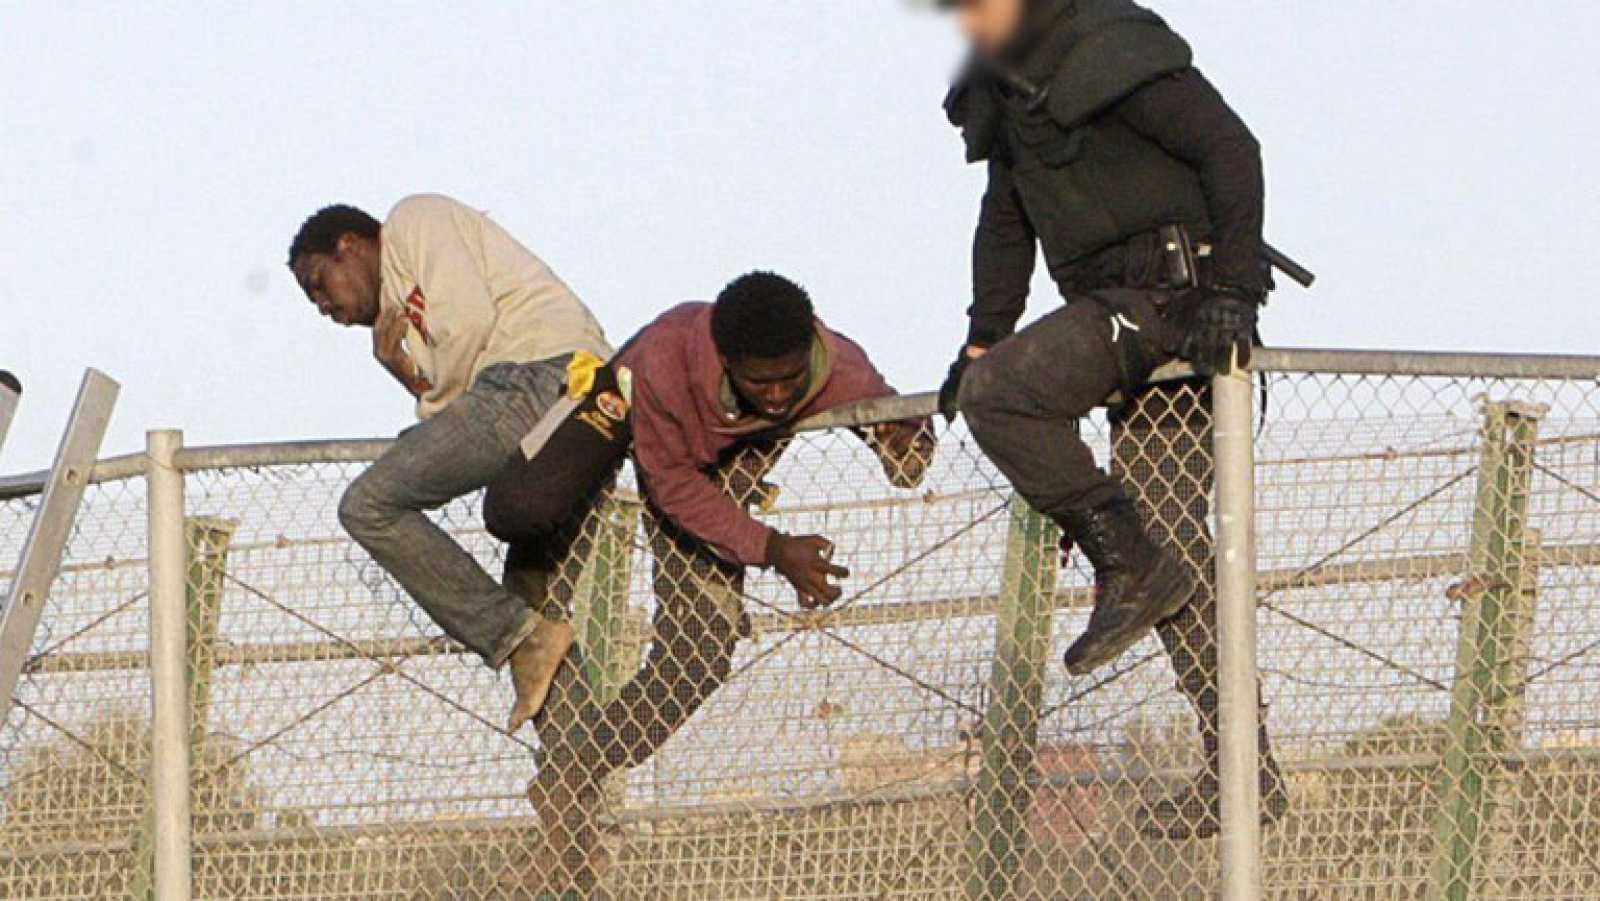 Segundo intento de salto a la valla de Melilla en menos de 48 horas